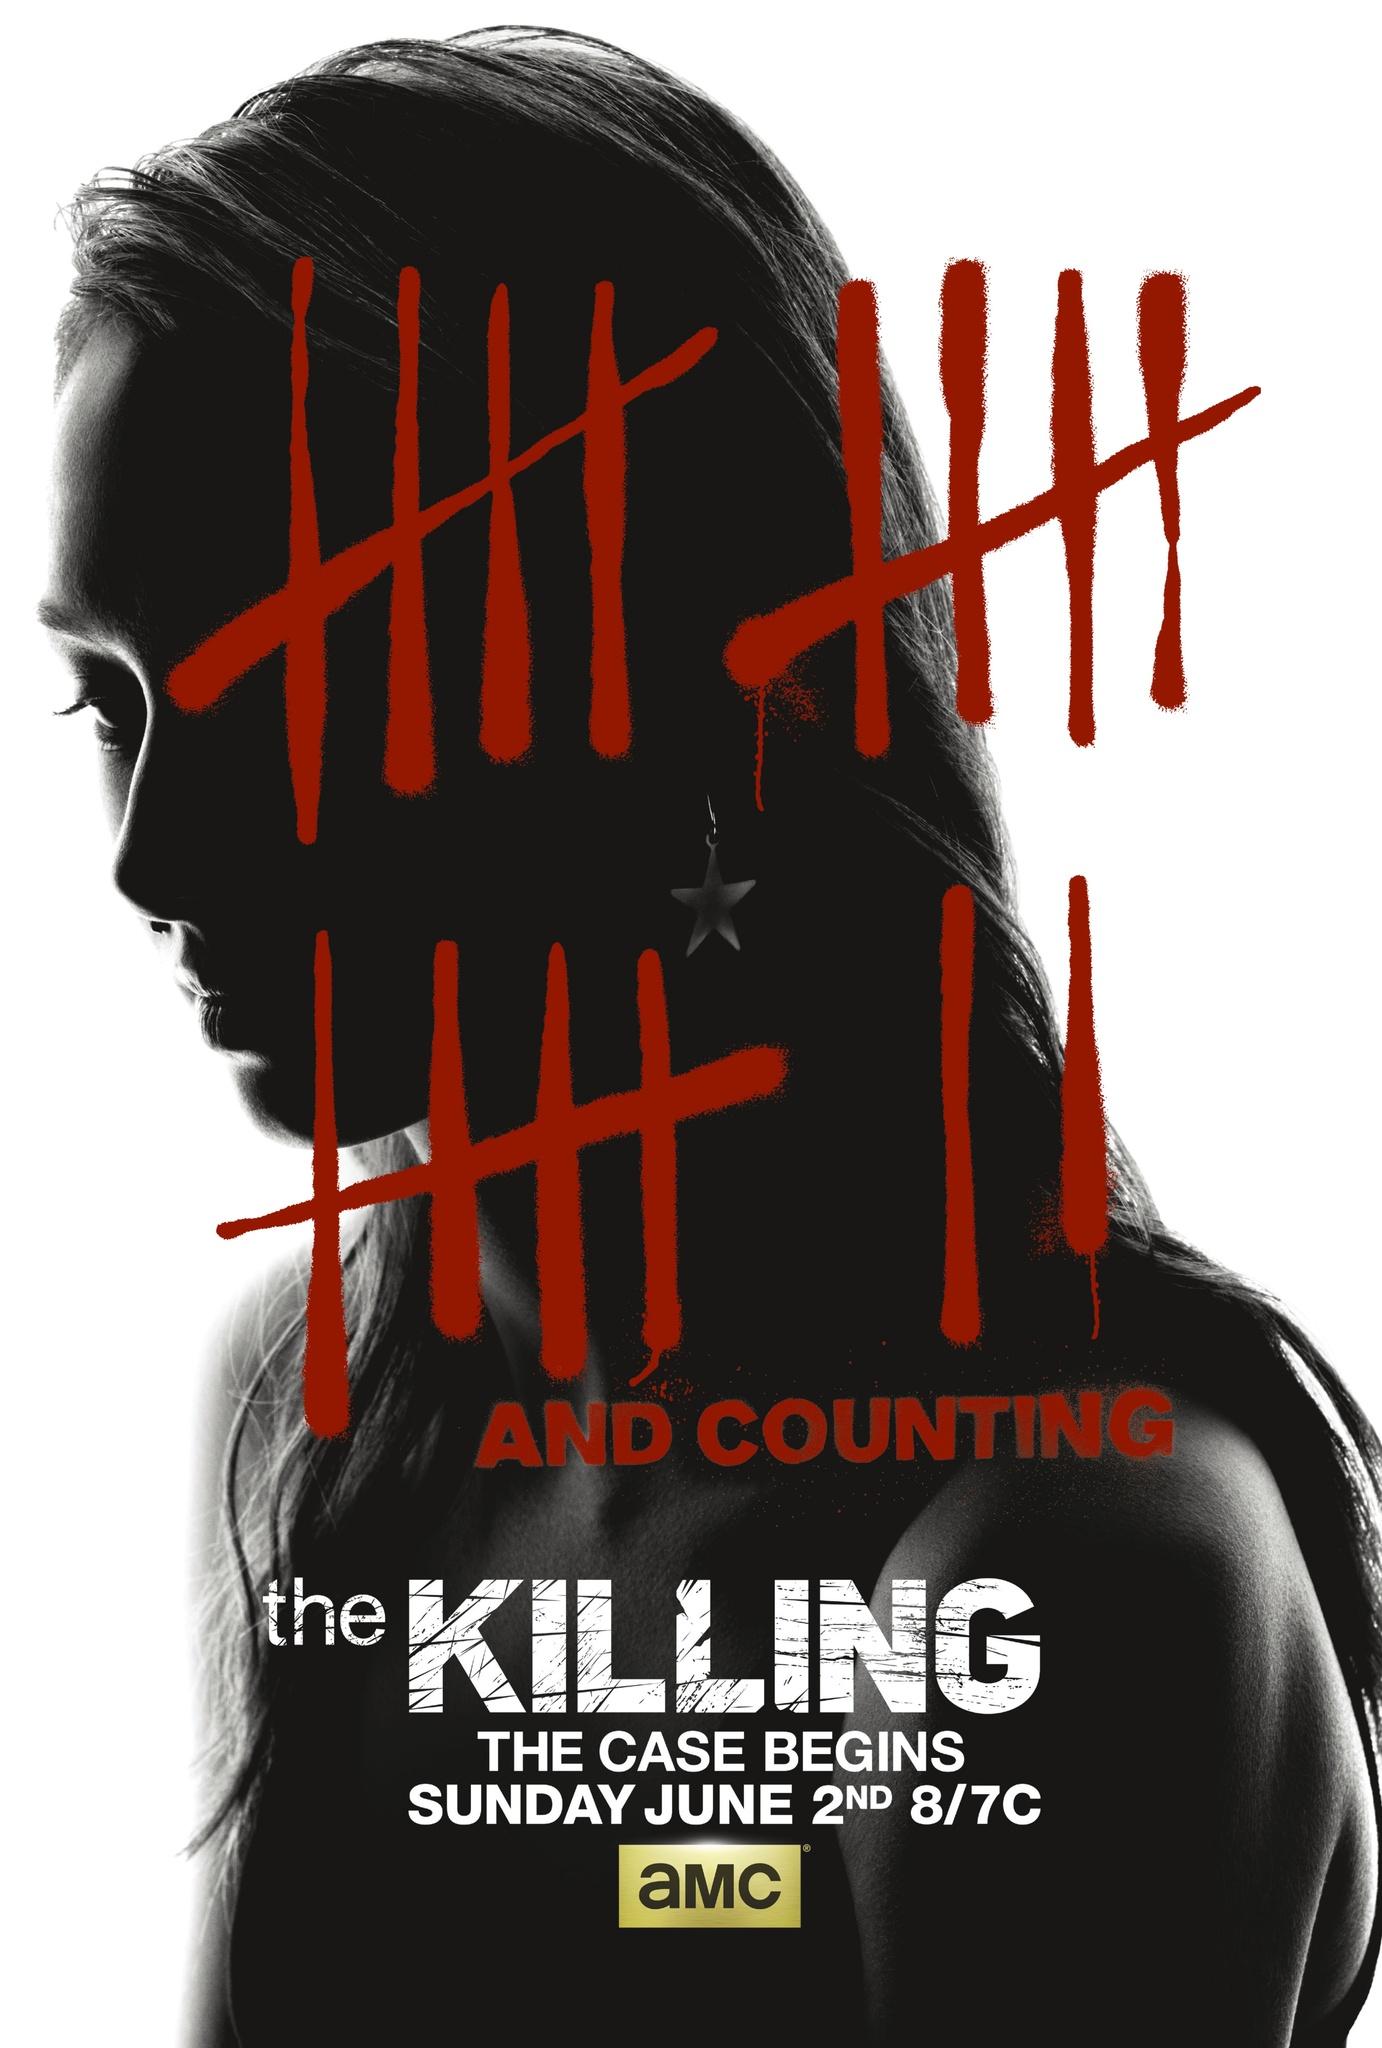 THE-KILLING-Season-3-Poster.jpg